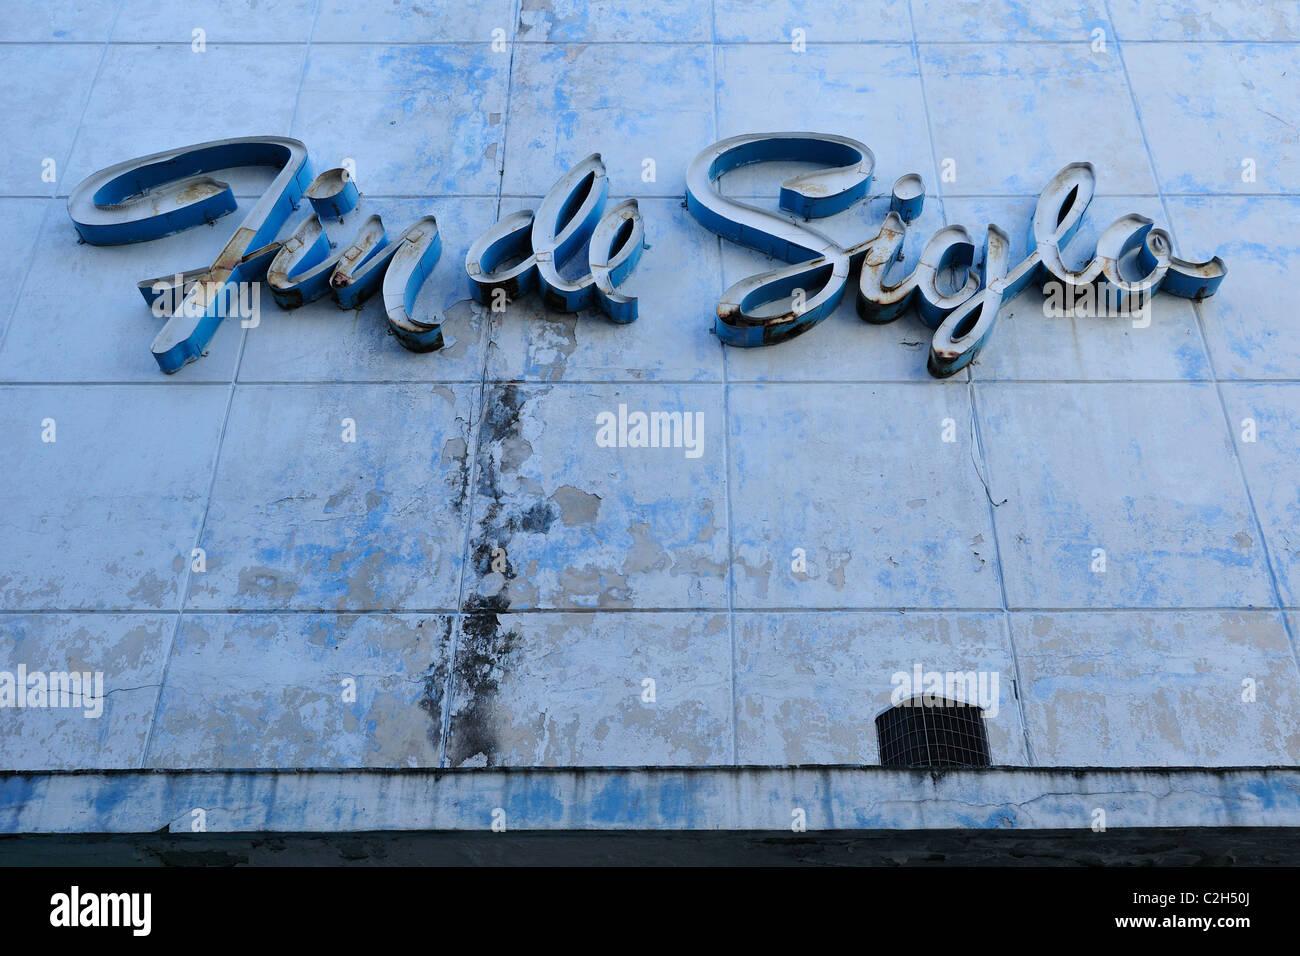 Havana. Cuba. Centro Habana. Fin de Siglo signage on a cinema building. - Stock Image